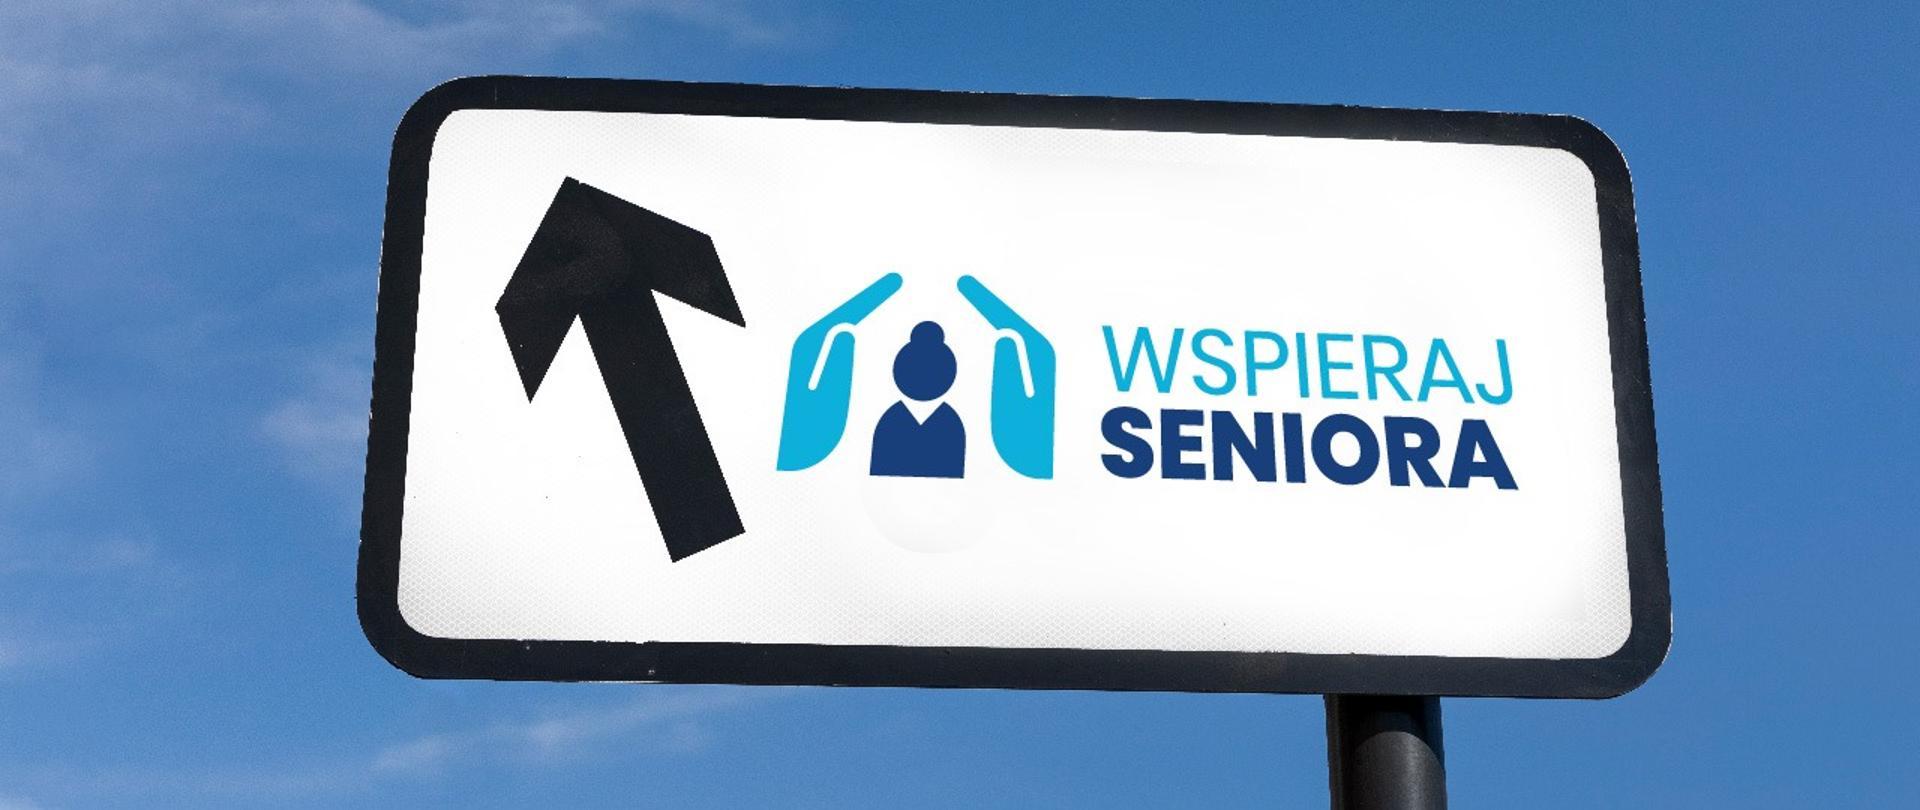 Wspieraj seniora - dla Gmin